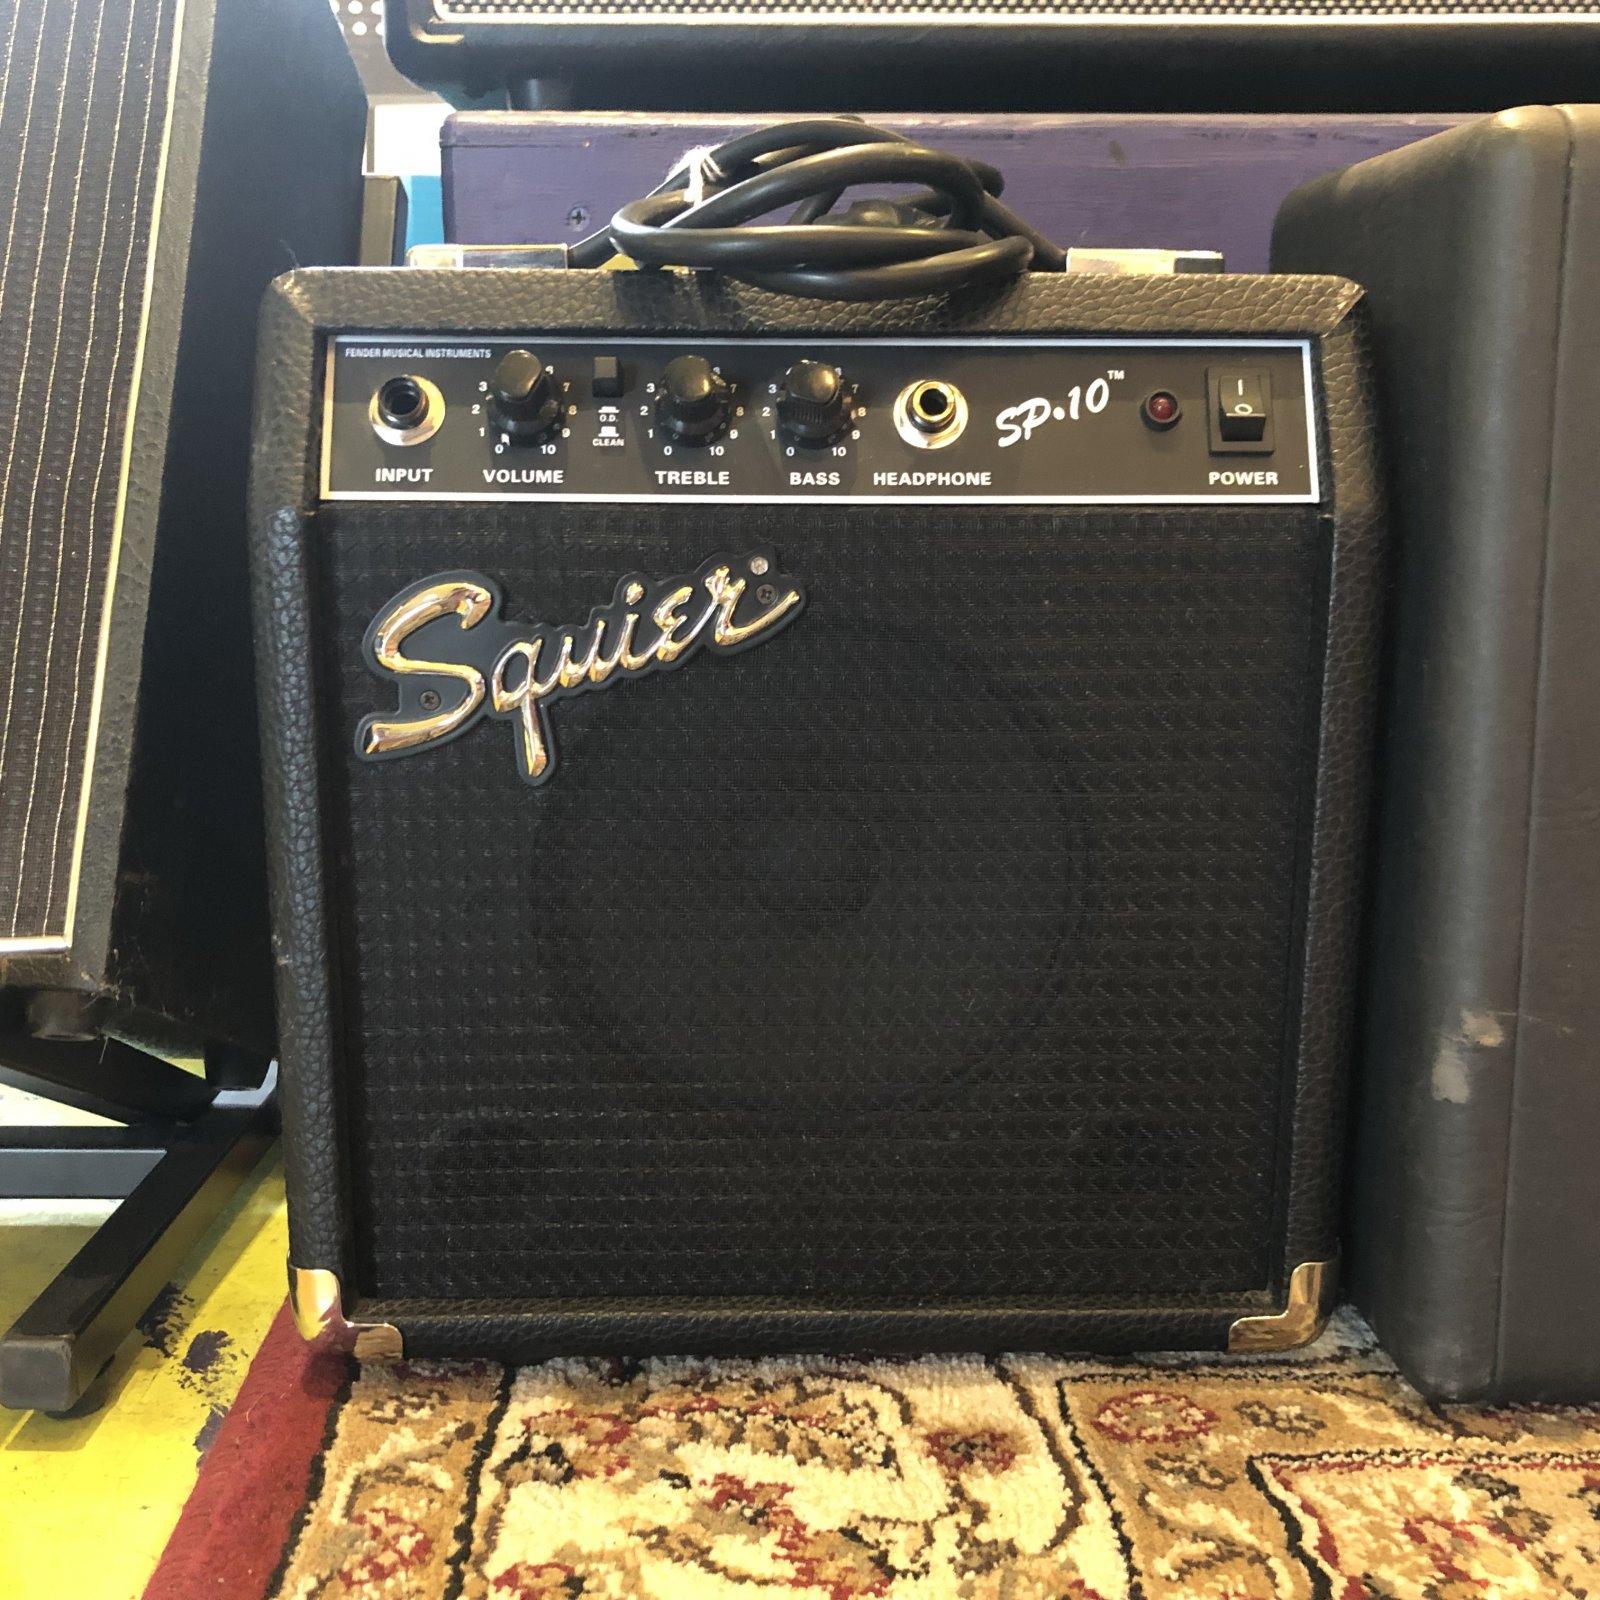 Used Squier SP-10 Amplifier